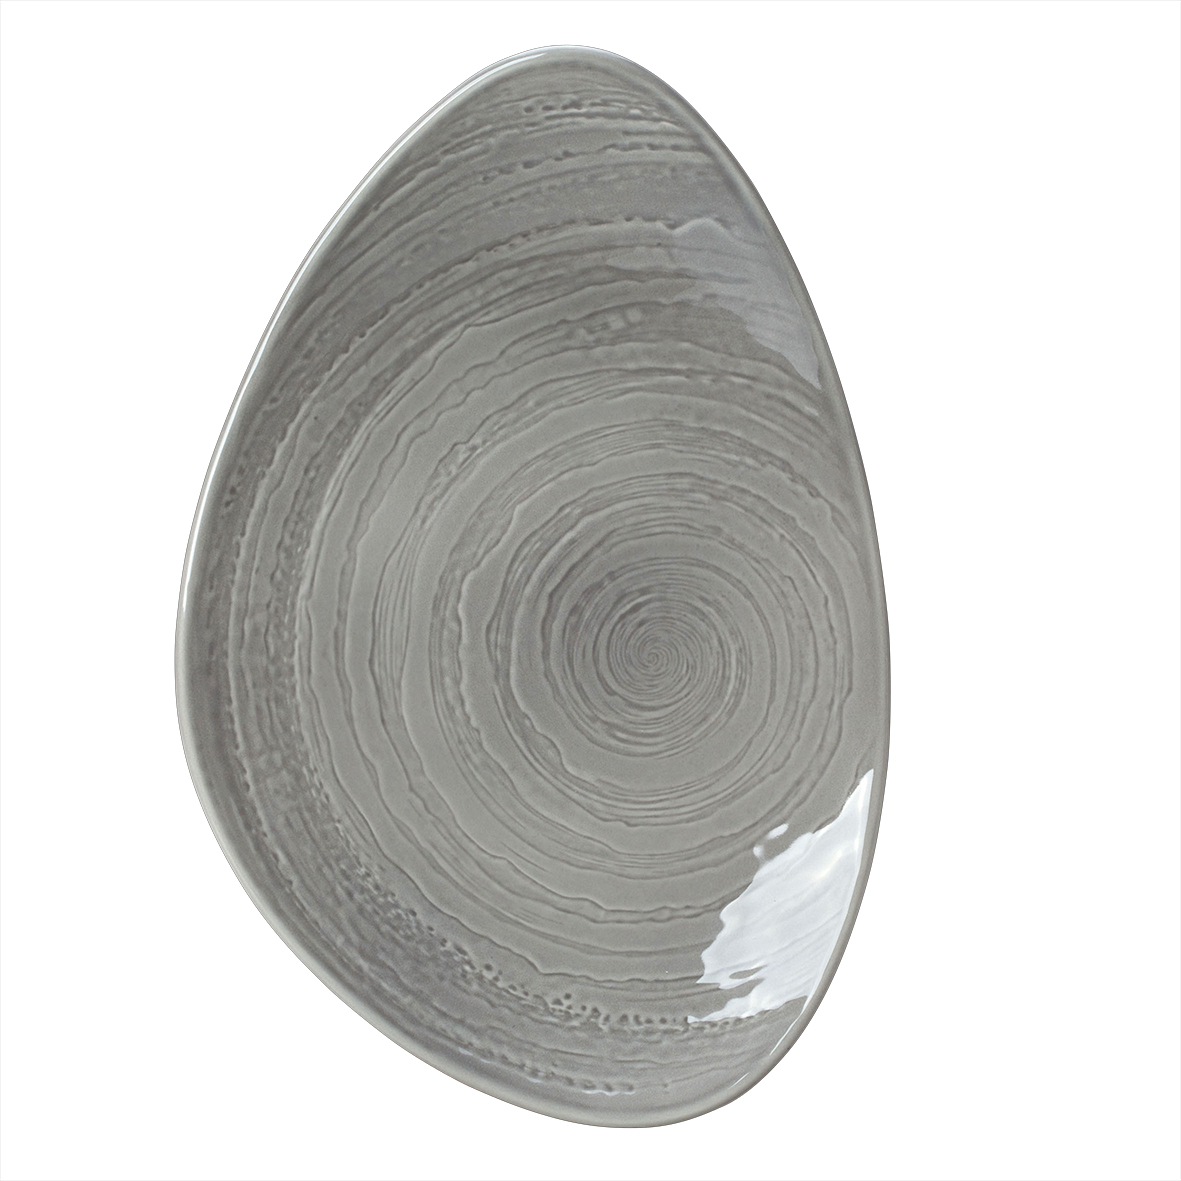 Блюдо фарфоровое асимметричное Steelite SCAPE GREY, длина 37,5 см, серый Steelite 1402X0060 фото 1